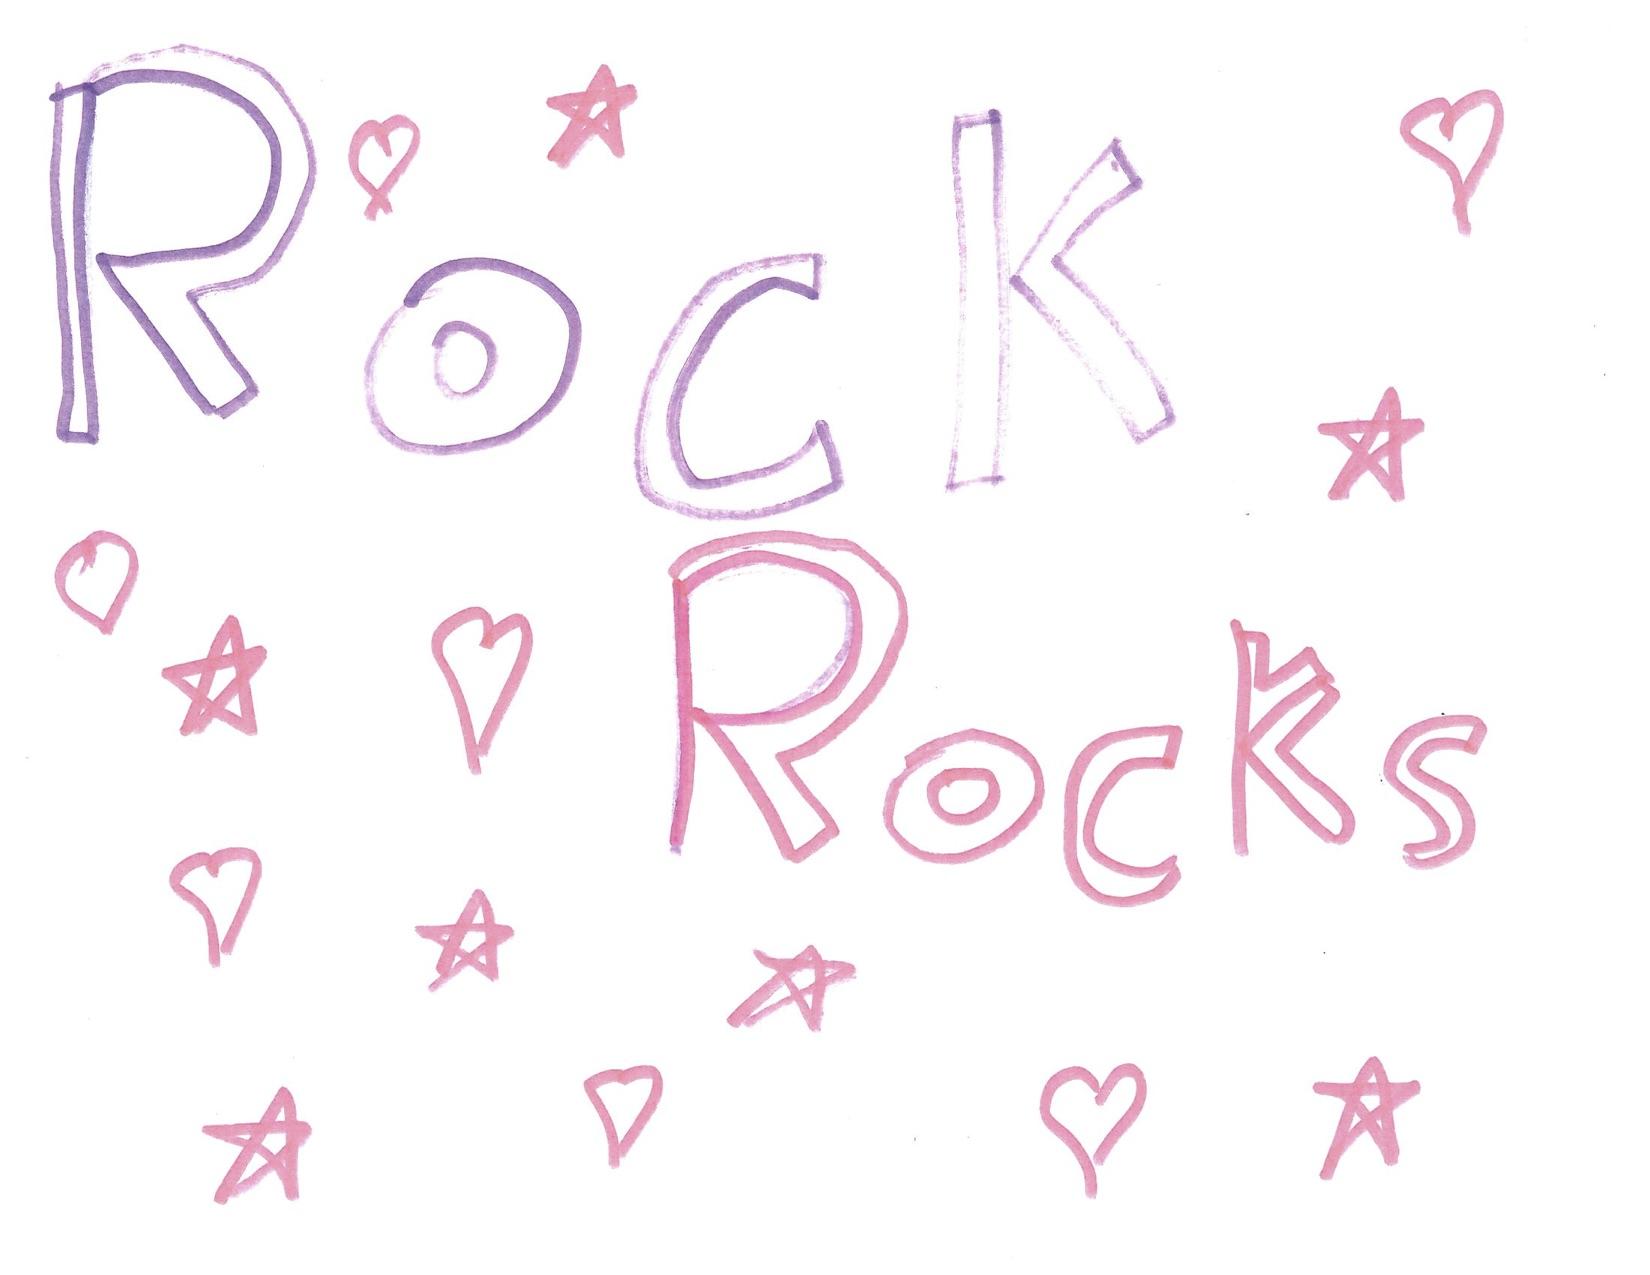 Rock-paper-v5-6.jpg